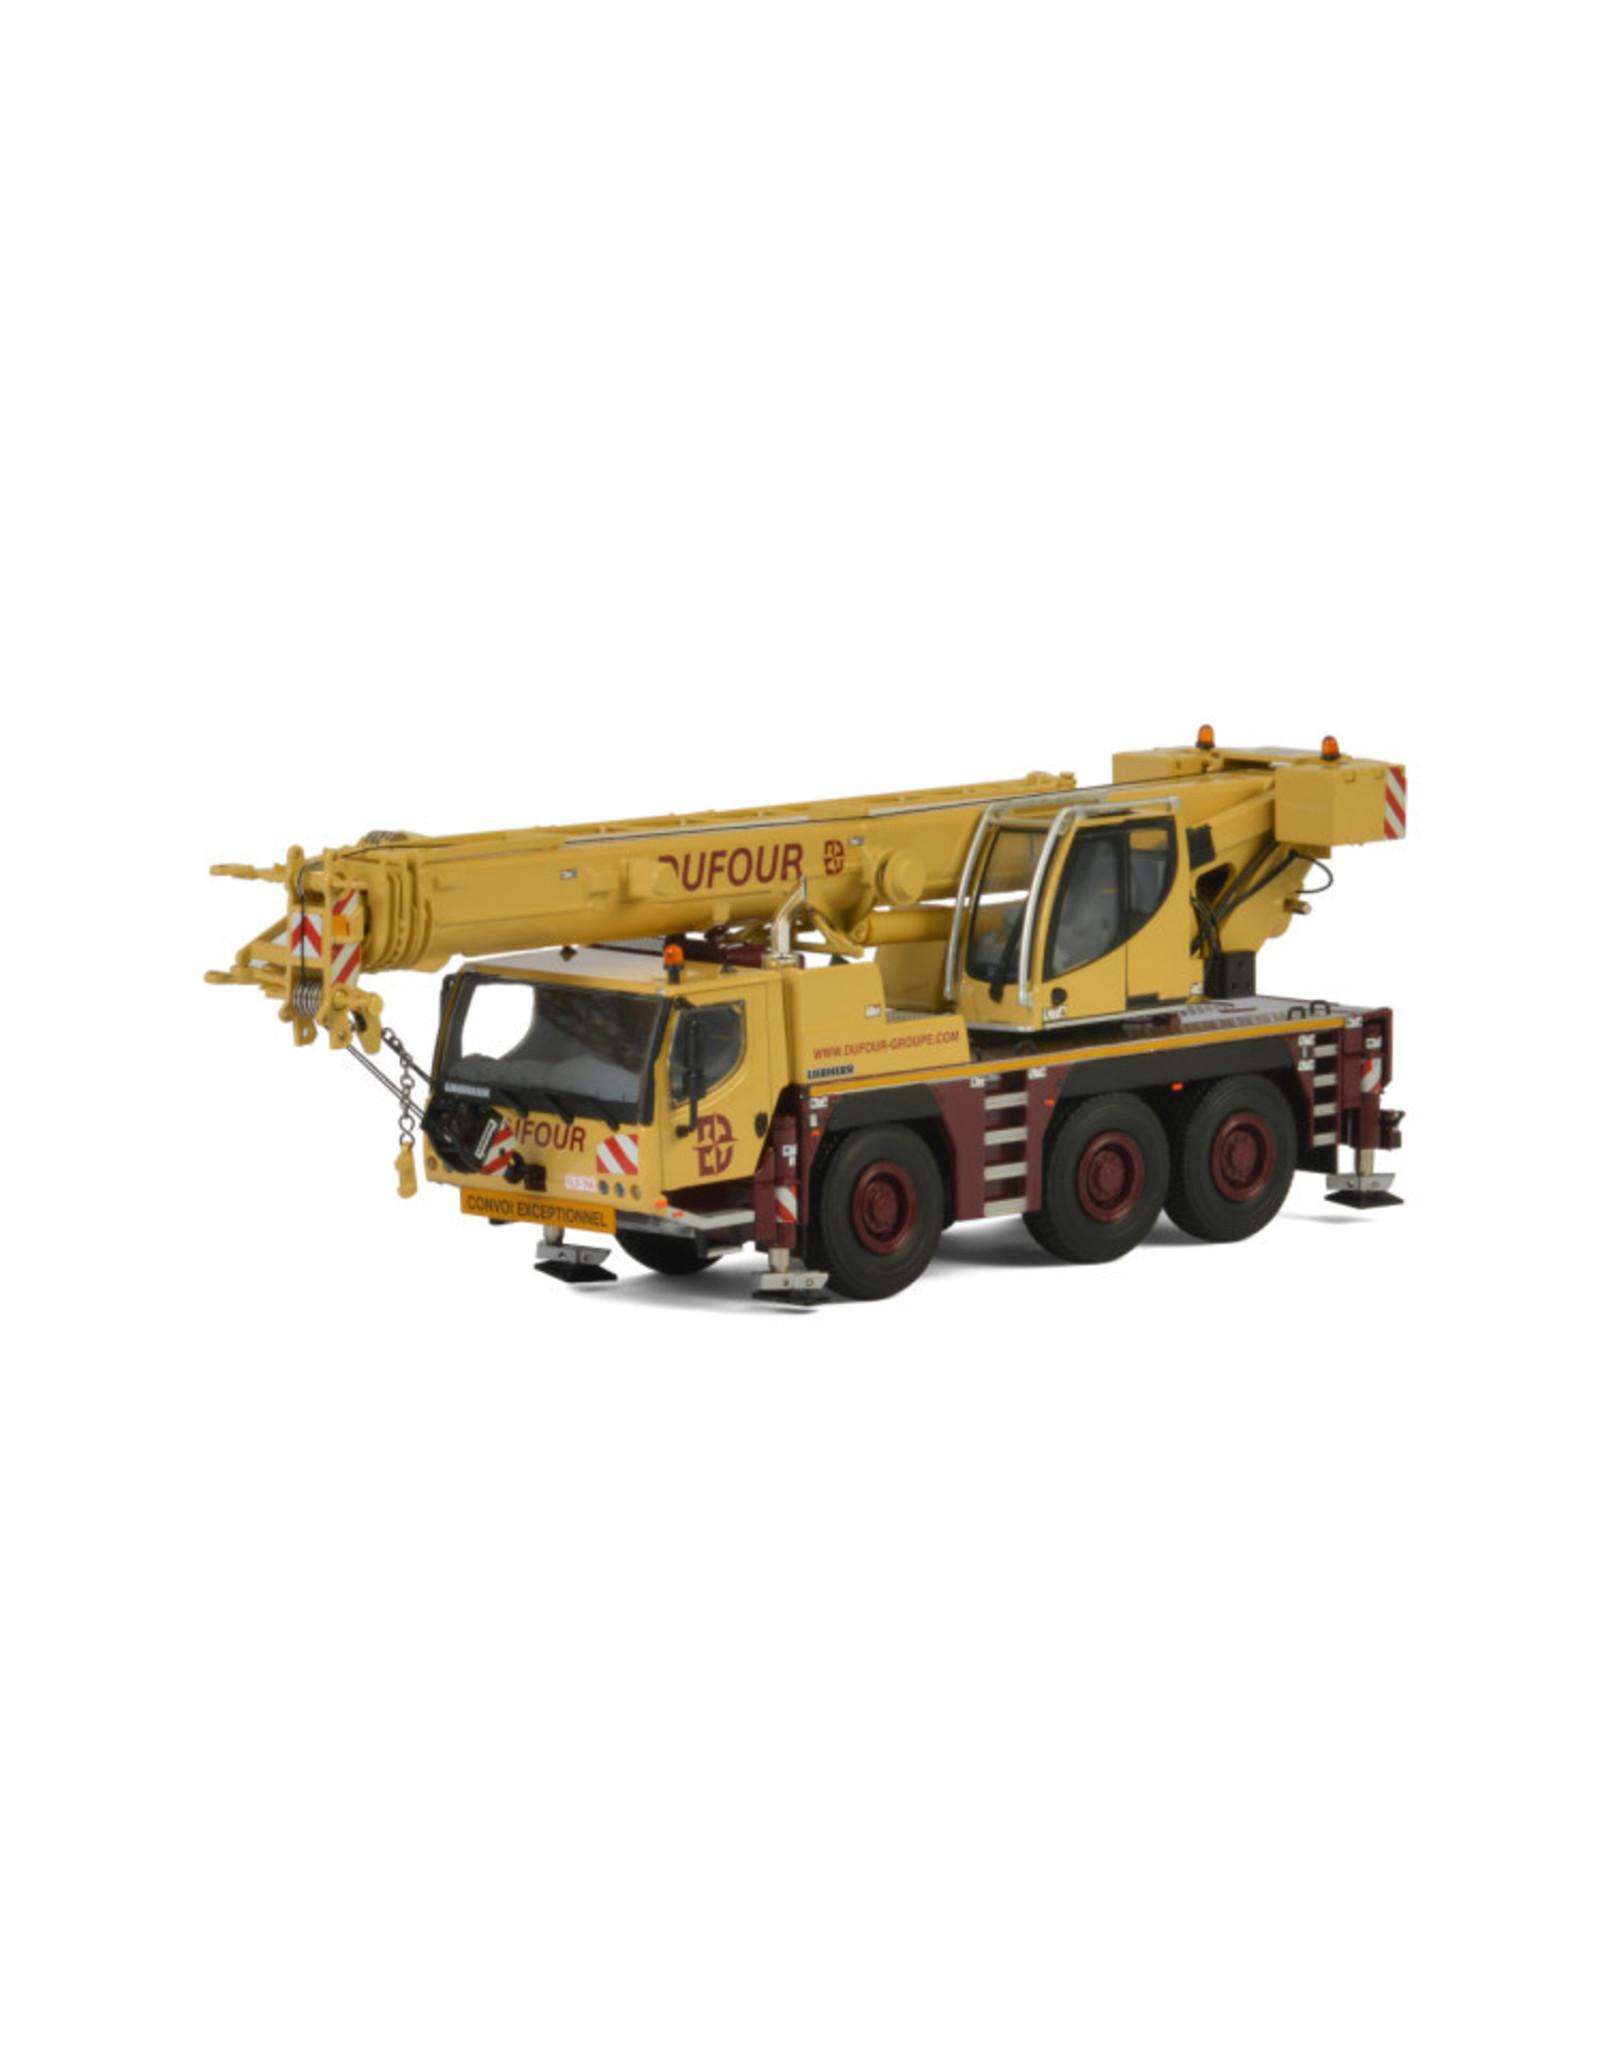 Liebherr Liebherr LTM 1050 'Dufour Group' - 1:50- WSI Models